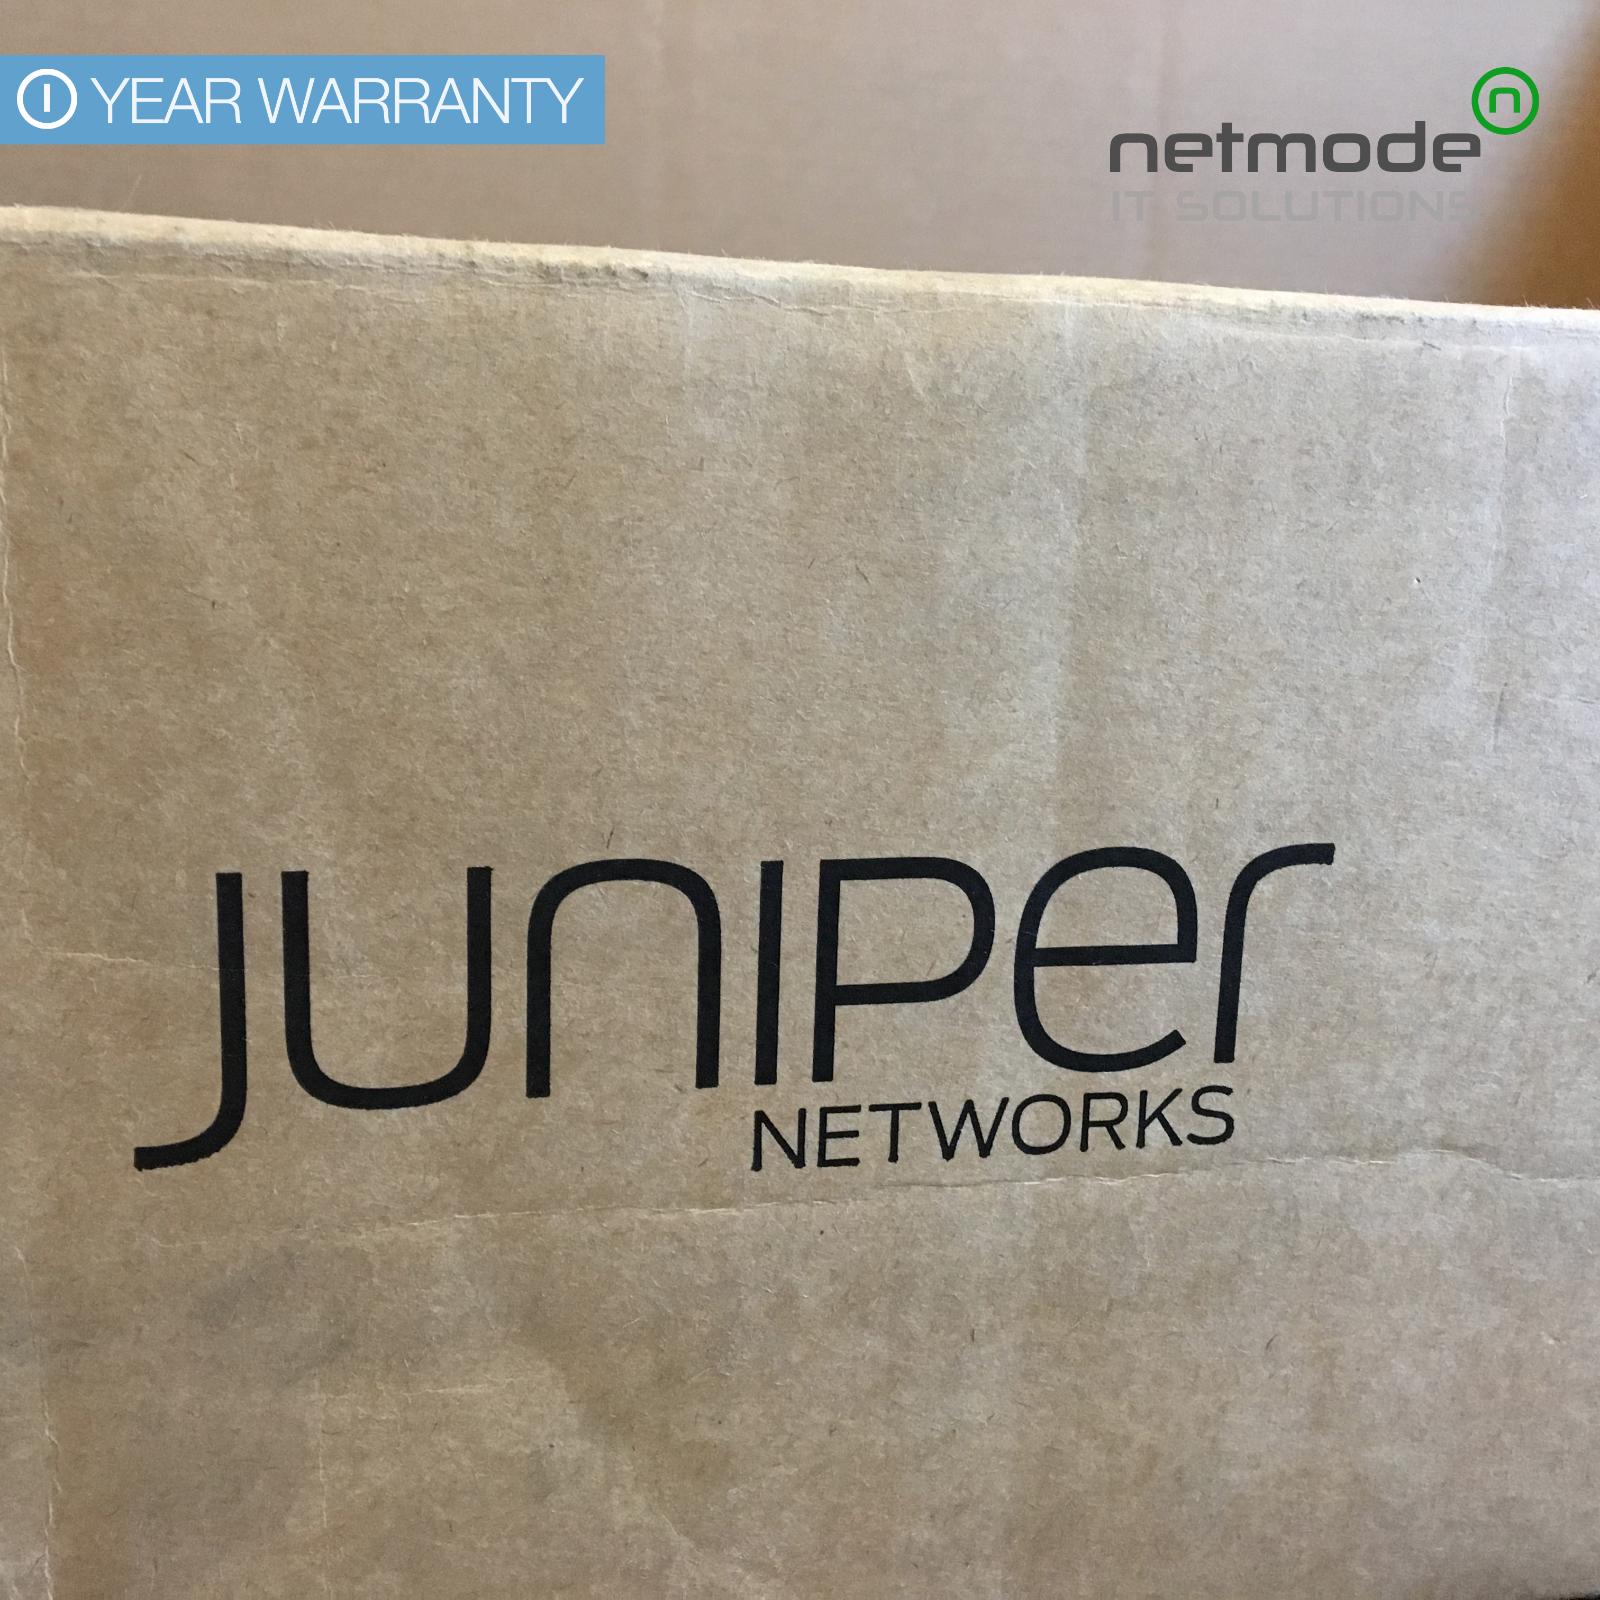 Juniper Networks Juniper EX 4200 (EX4200-24T) 24-Ports External Switch  Managed stackable